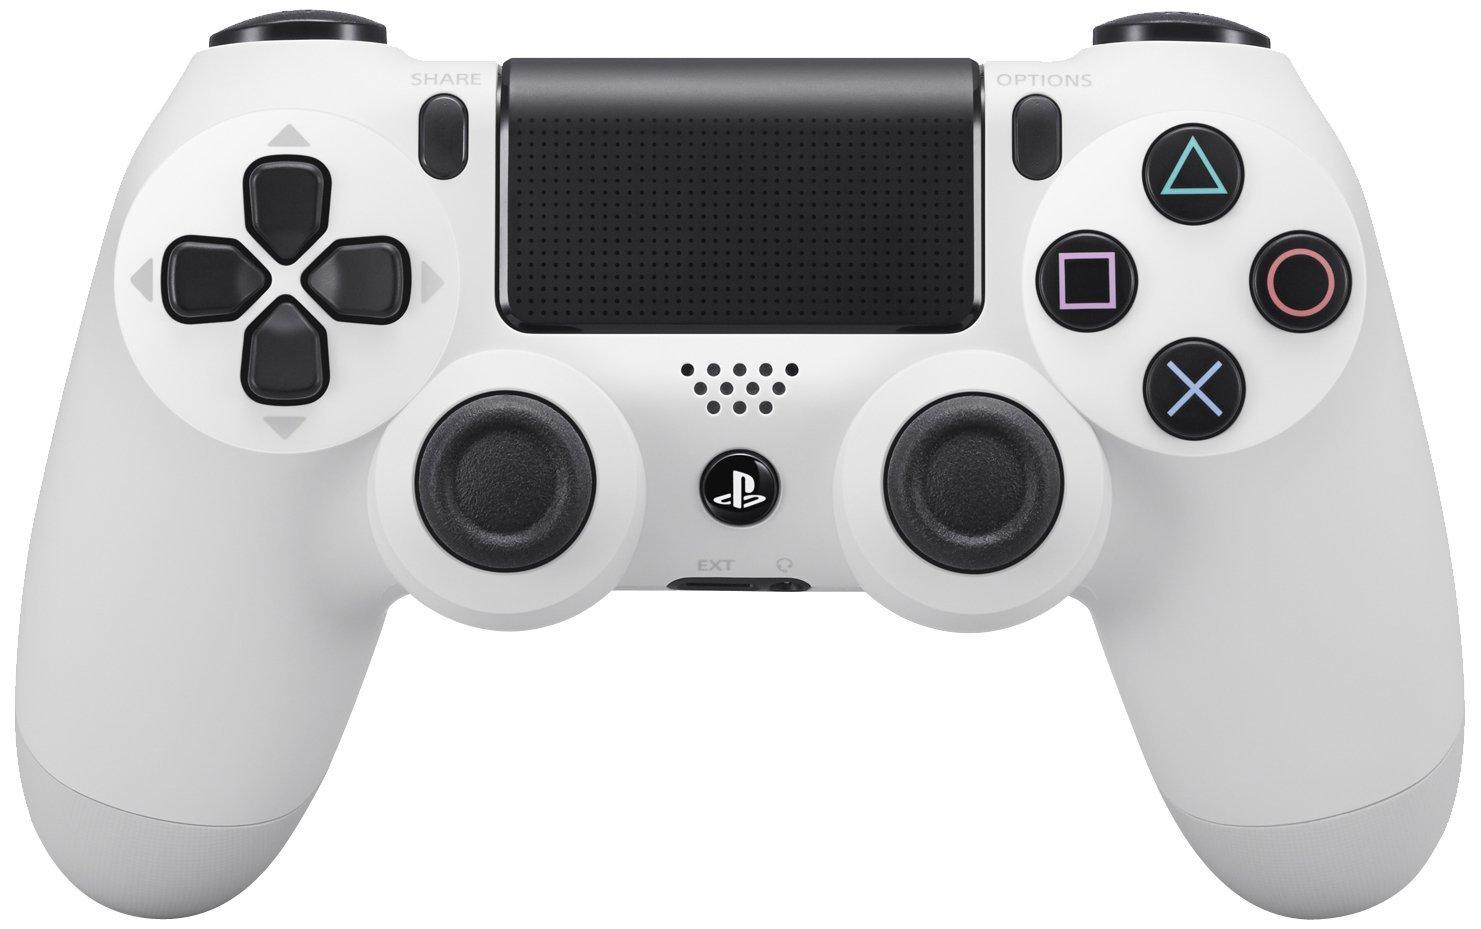 Геймпад беспроводной Sony Dualshock 4 [PS4] (White)